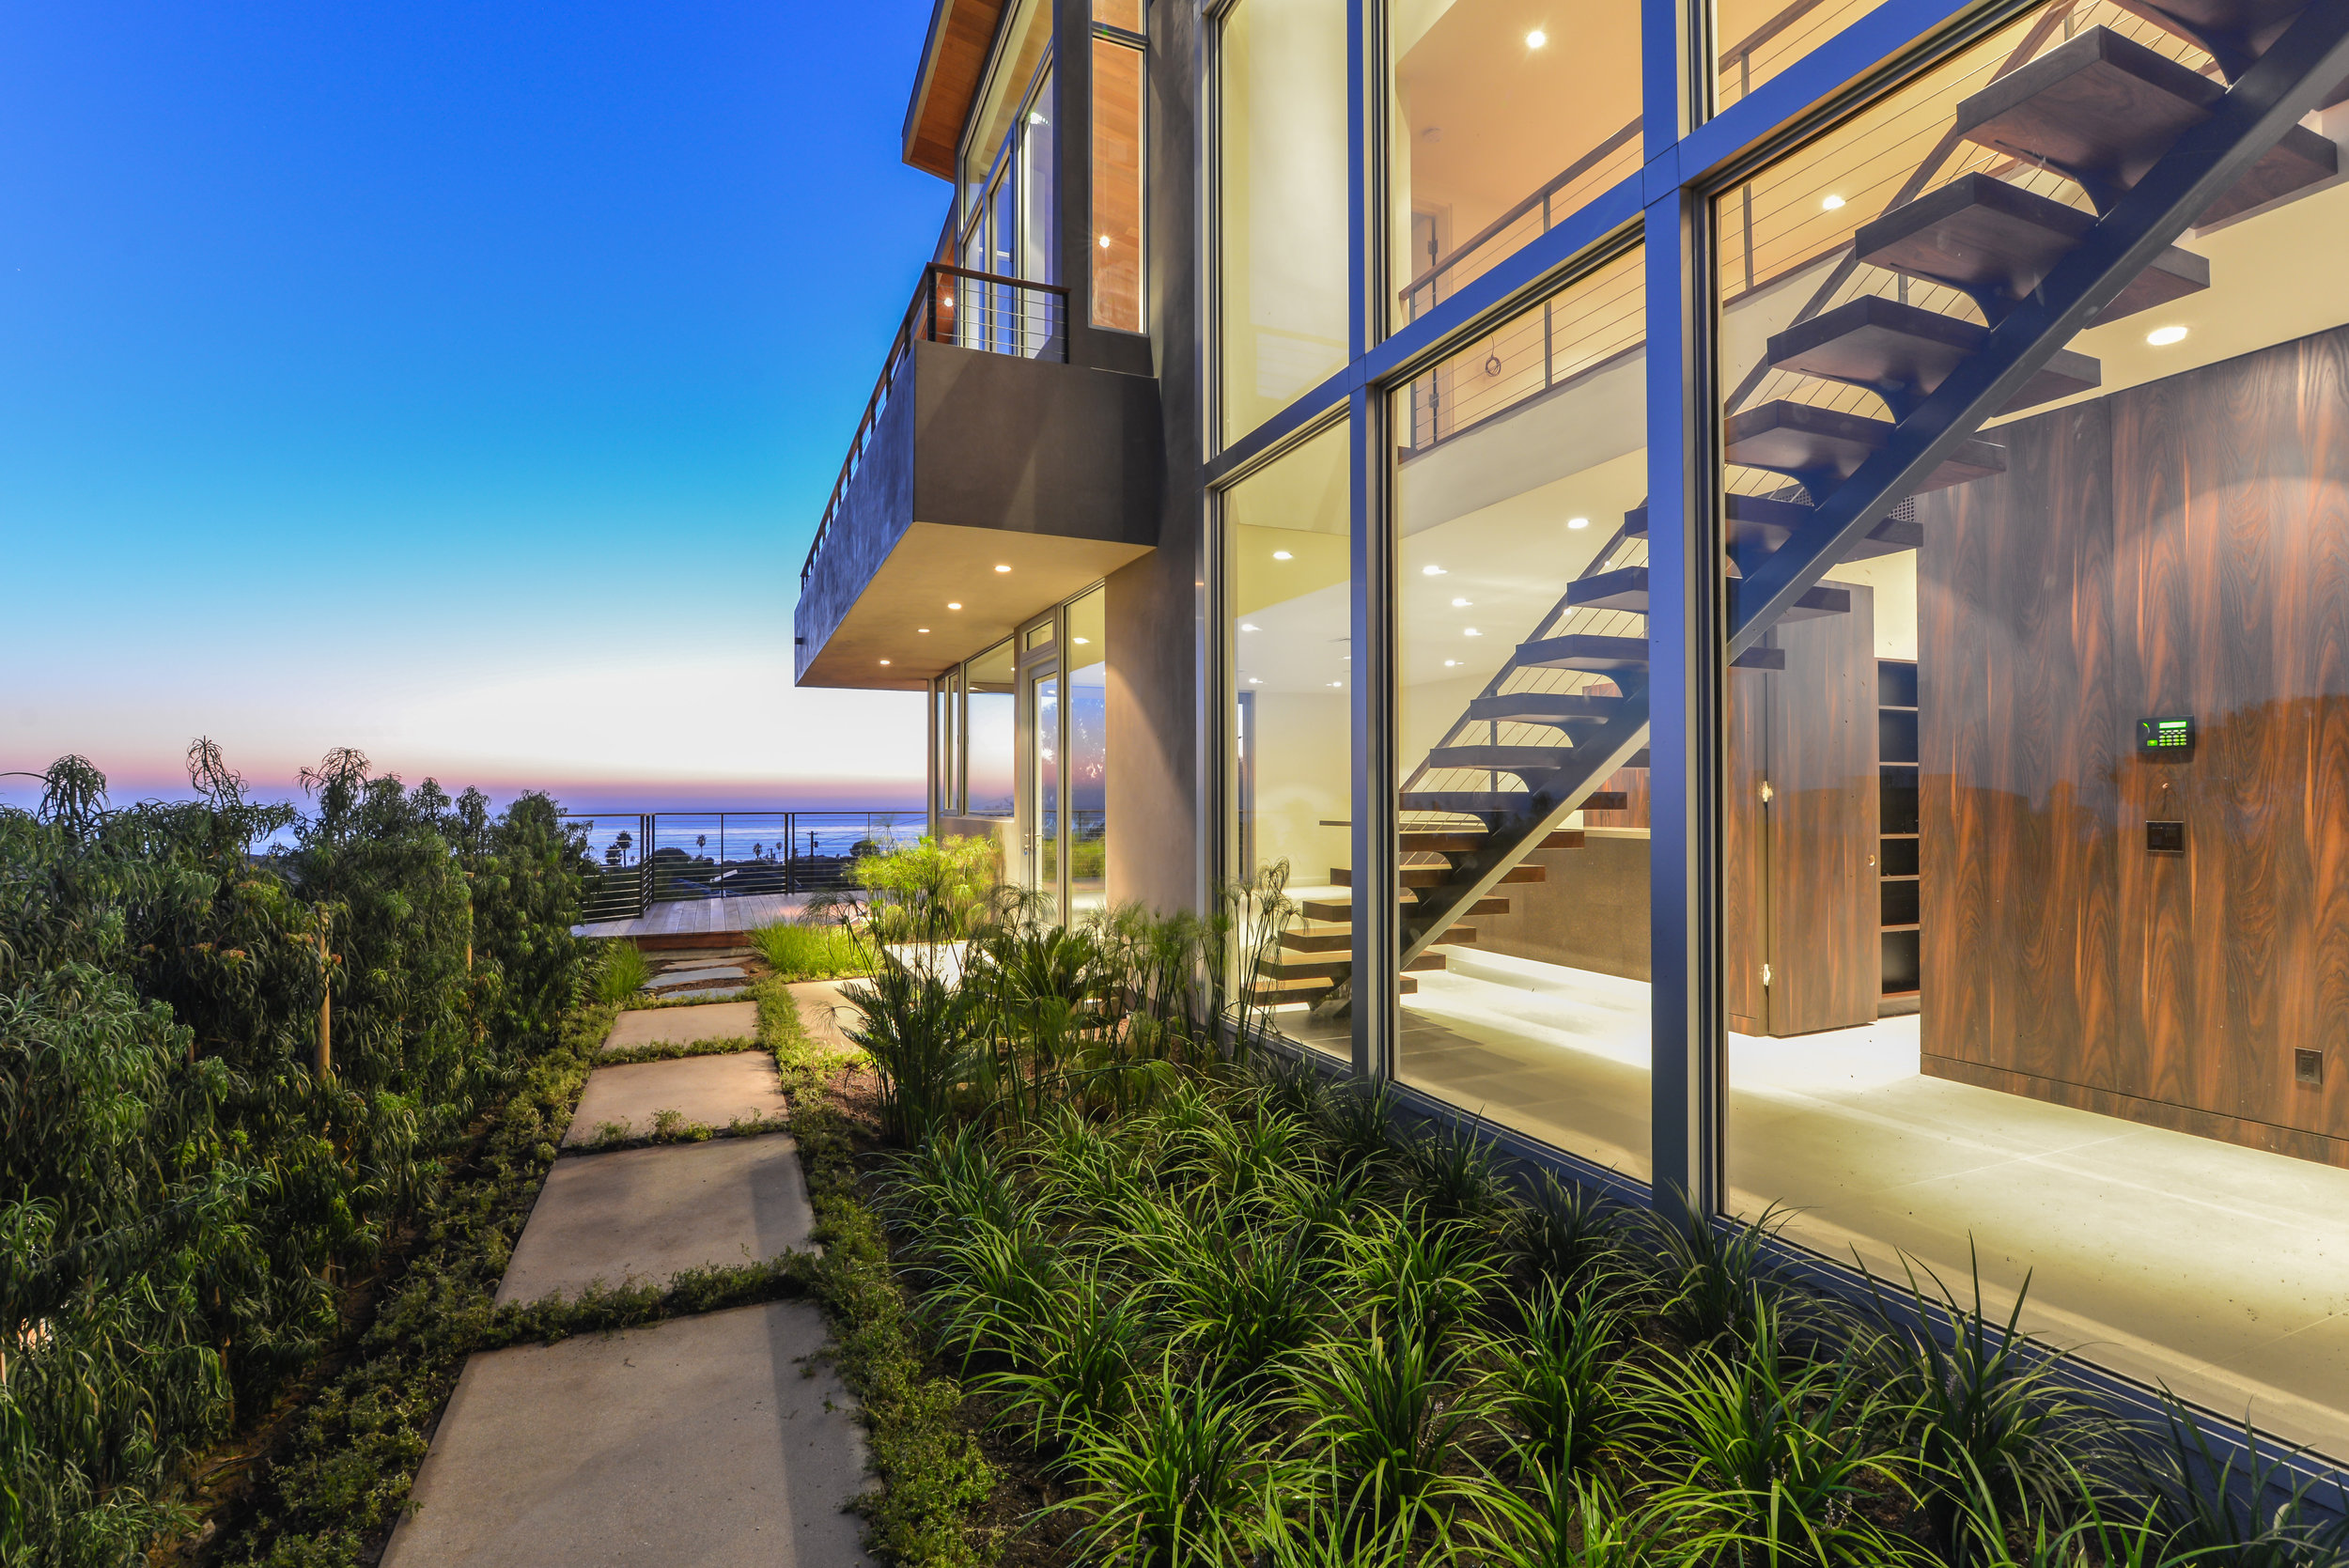 S.E.A.-Studio-Environmental-Architecture-David-Hertz-FAIA-Linda-Rosa-House-La-Jolla-San-Diego-sustainable-regenerative-restorative-design-modern-residential-mindful-garden-panoramic-ocean-view-open-concept-california-dream-1.jpg